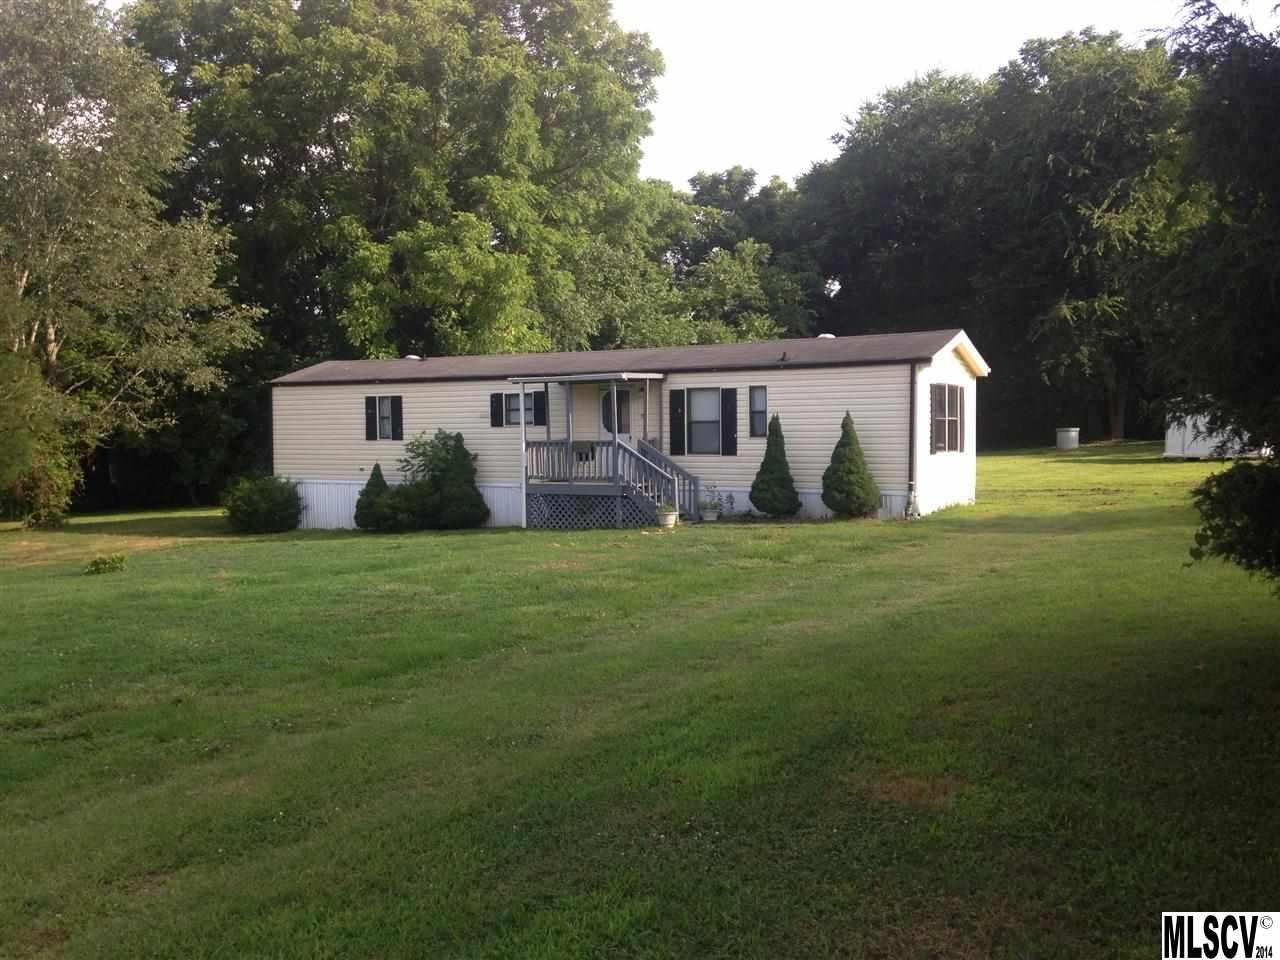 Real Estate for Sale, ListingId: 28954232, Claremont,NC28610